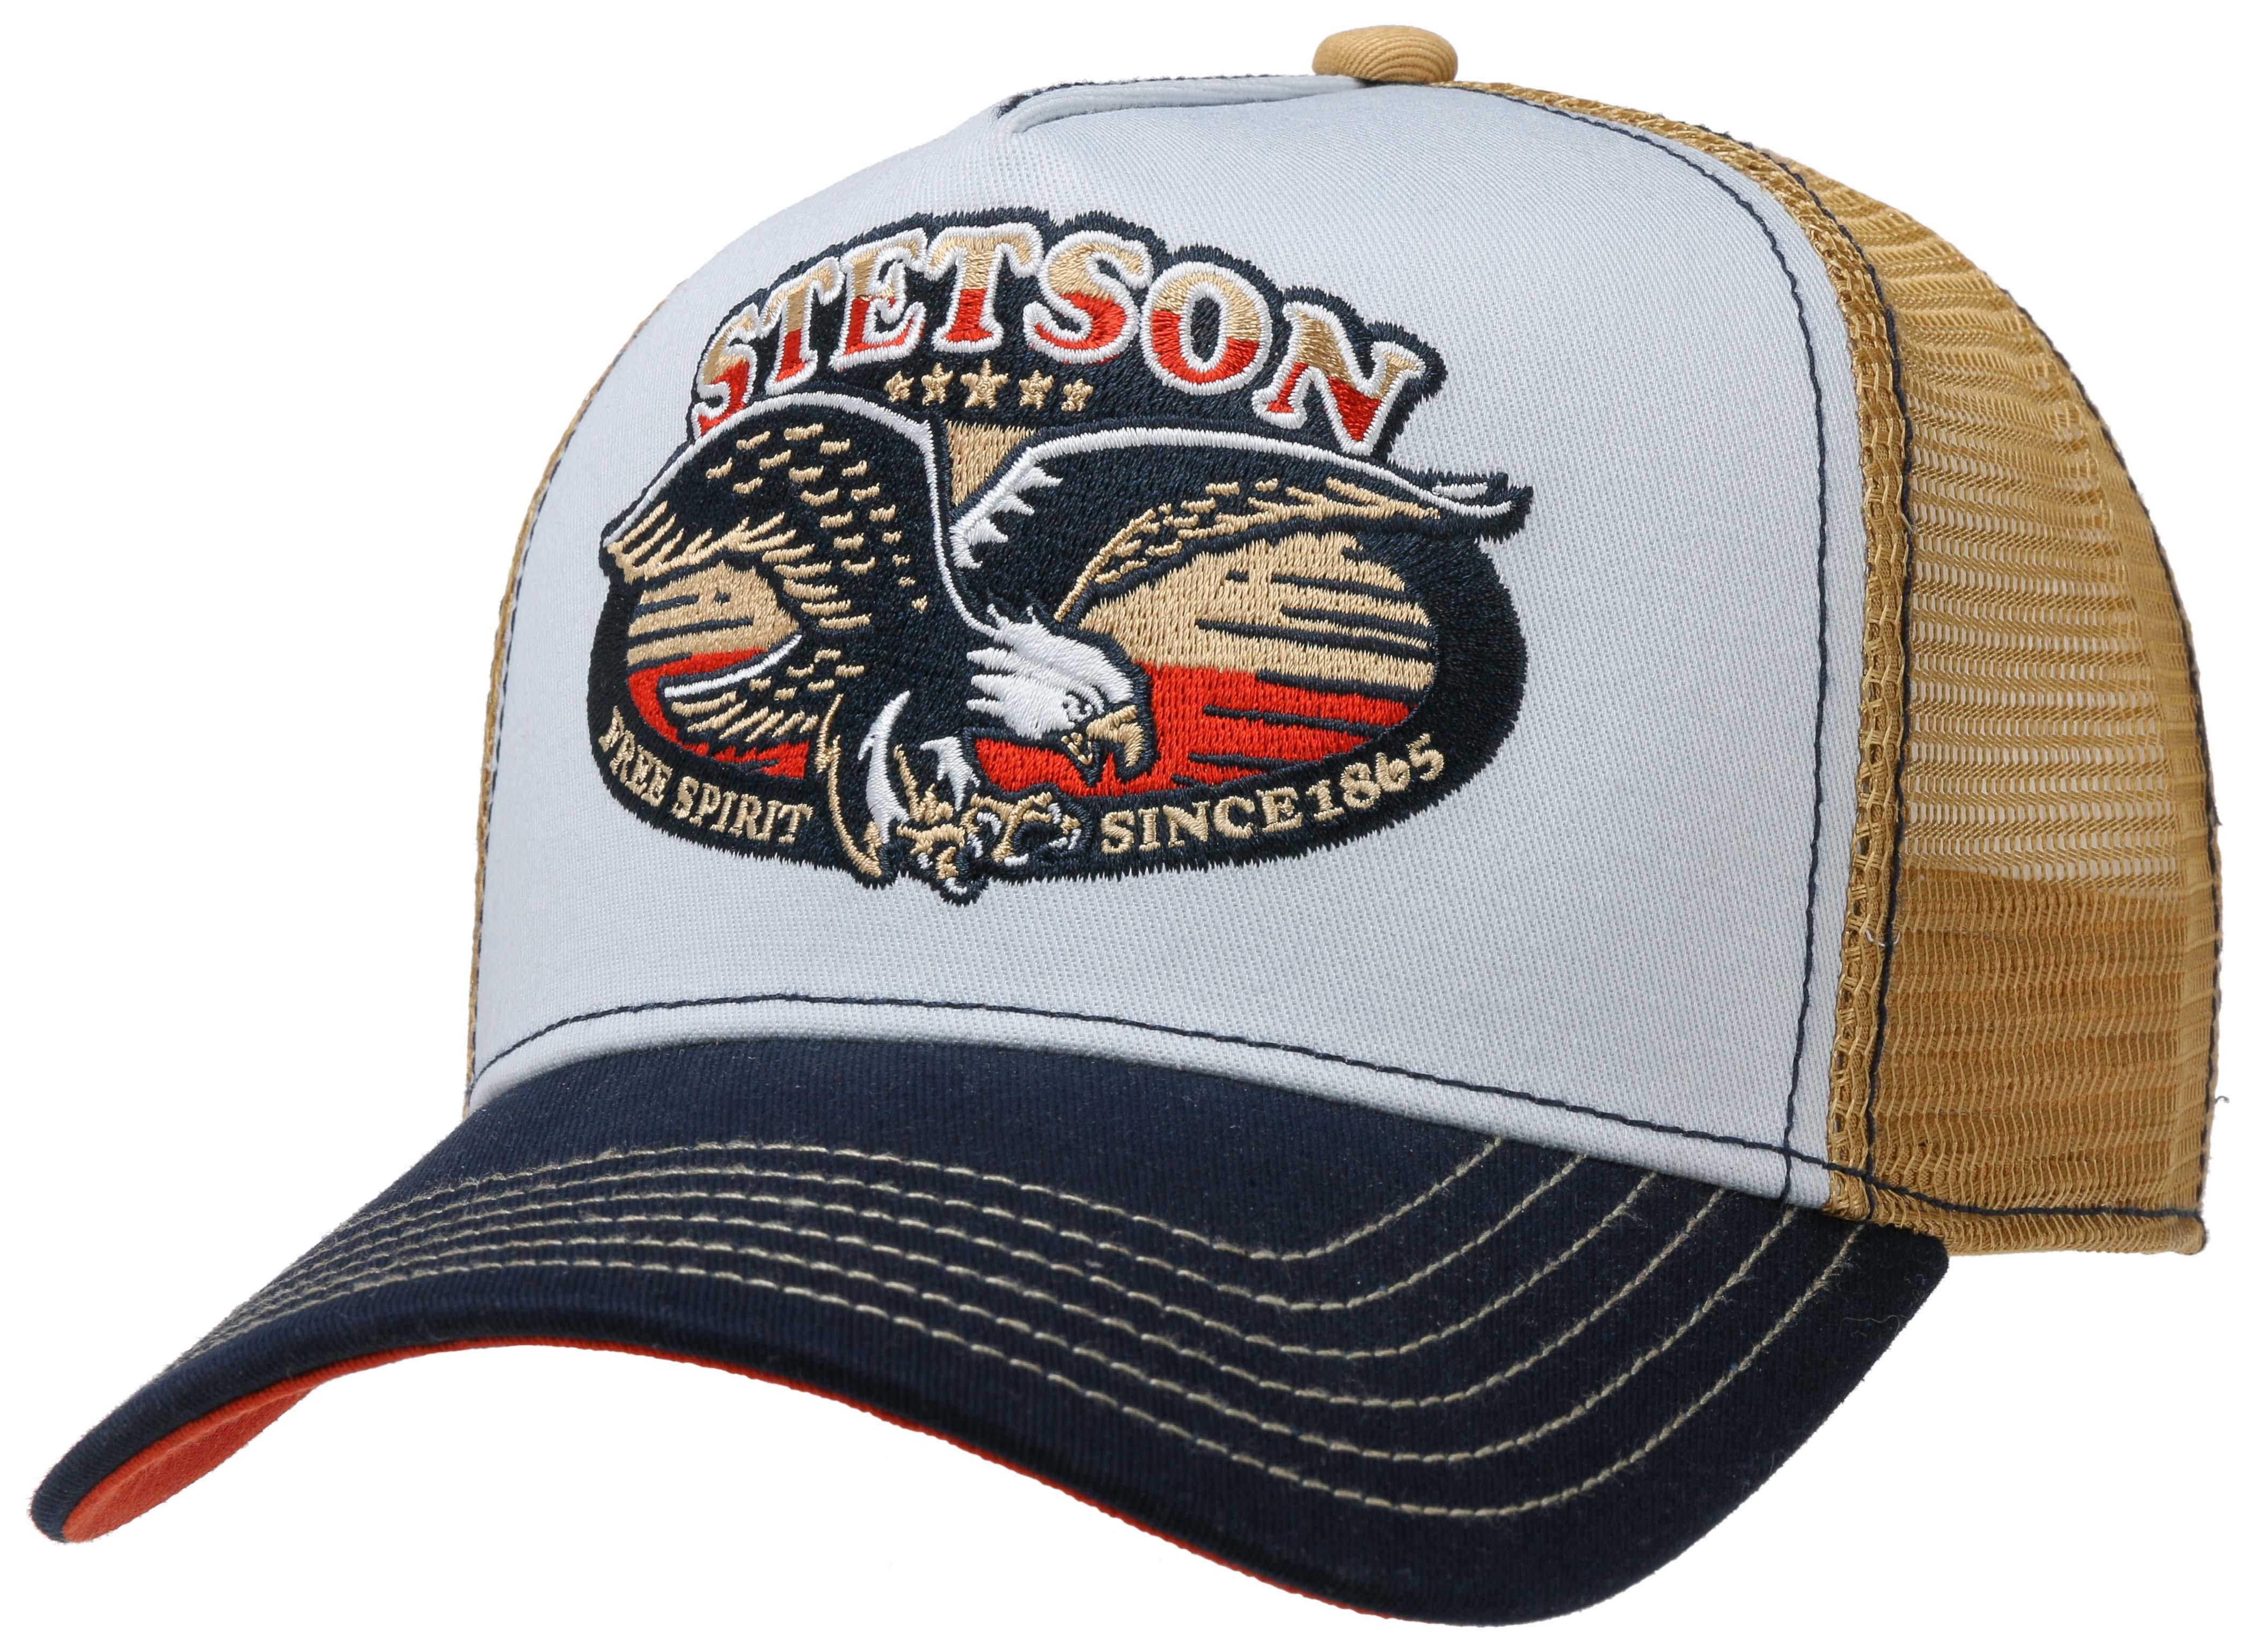 Stetson Trucker Cap Free Spirit